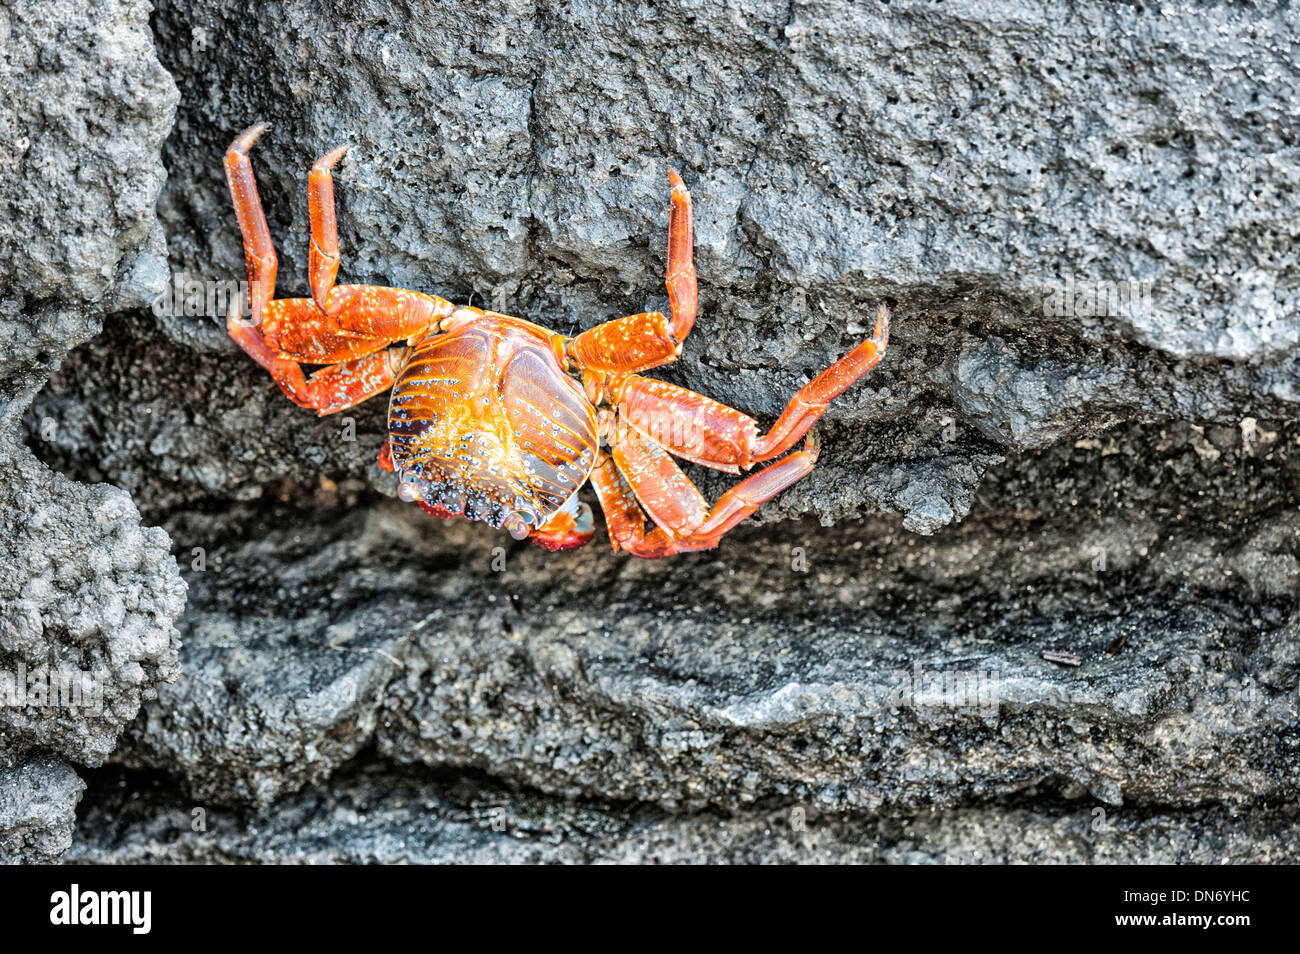 Sally Lightfoot crab (Grapsus grapsus) - Stock Image